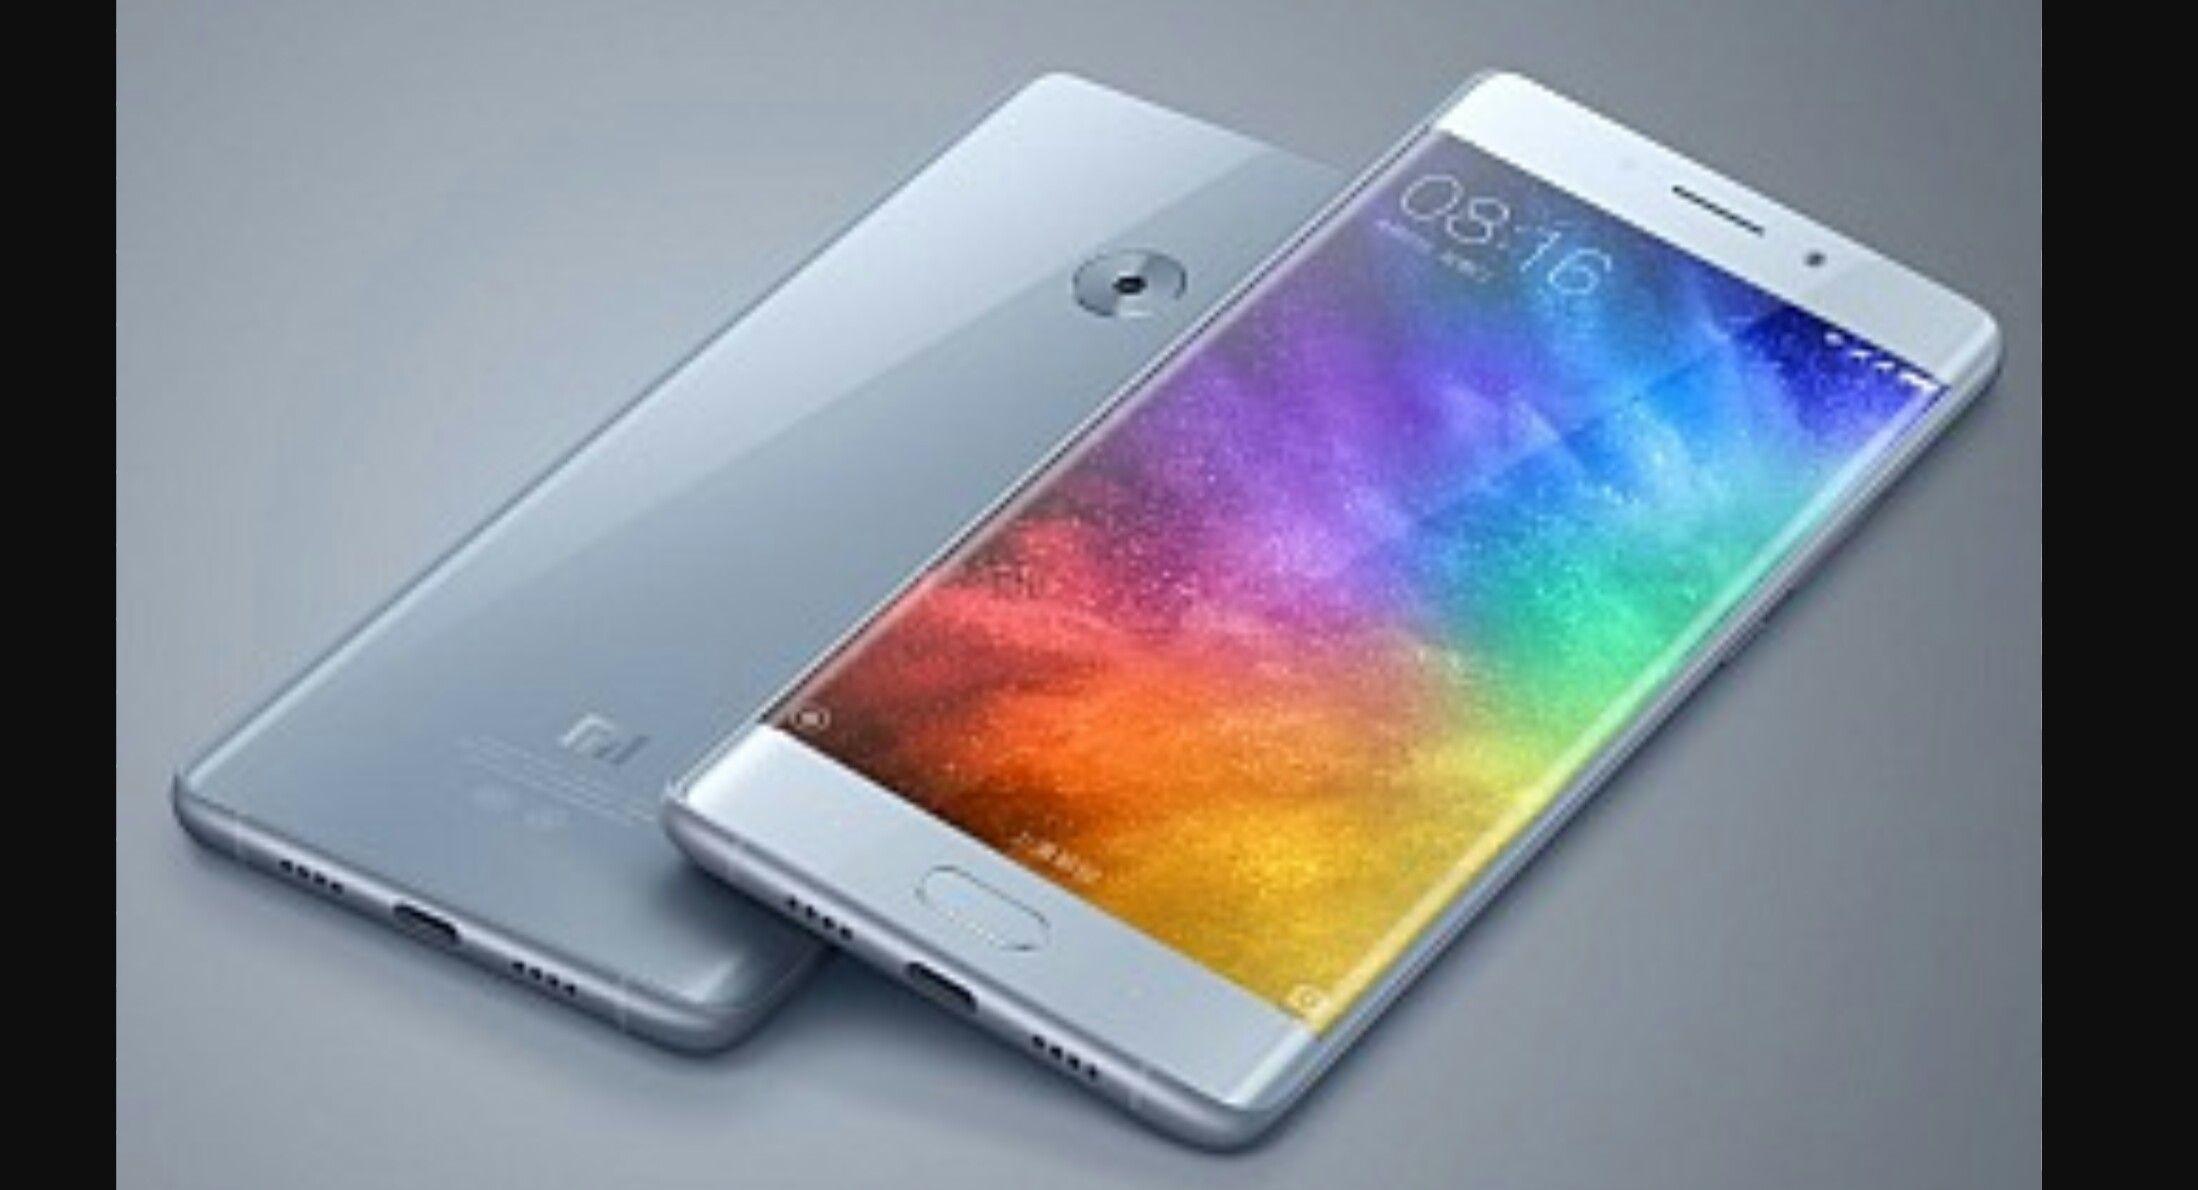 Pin by Anwar Shaikh on fav mobiles Xiaomi, Samsung note